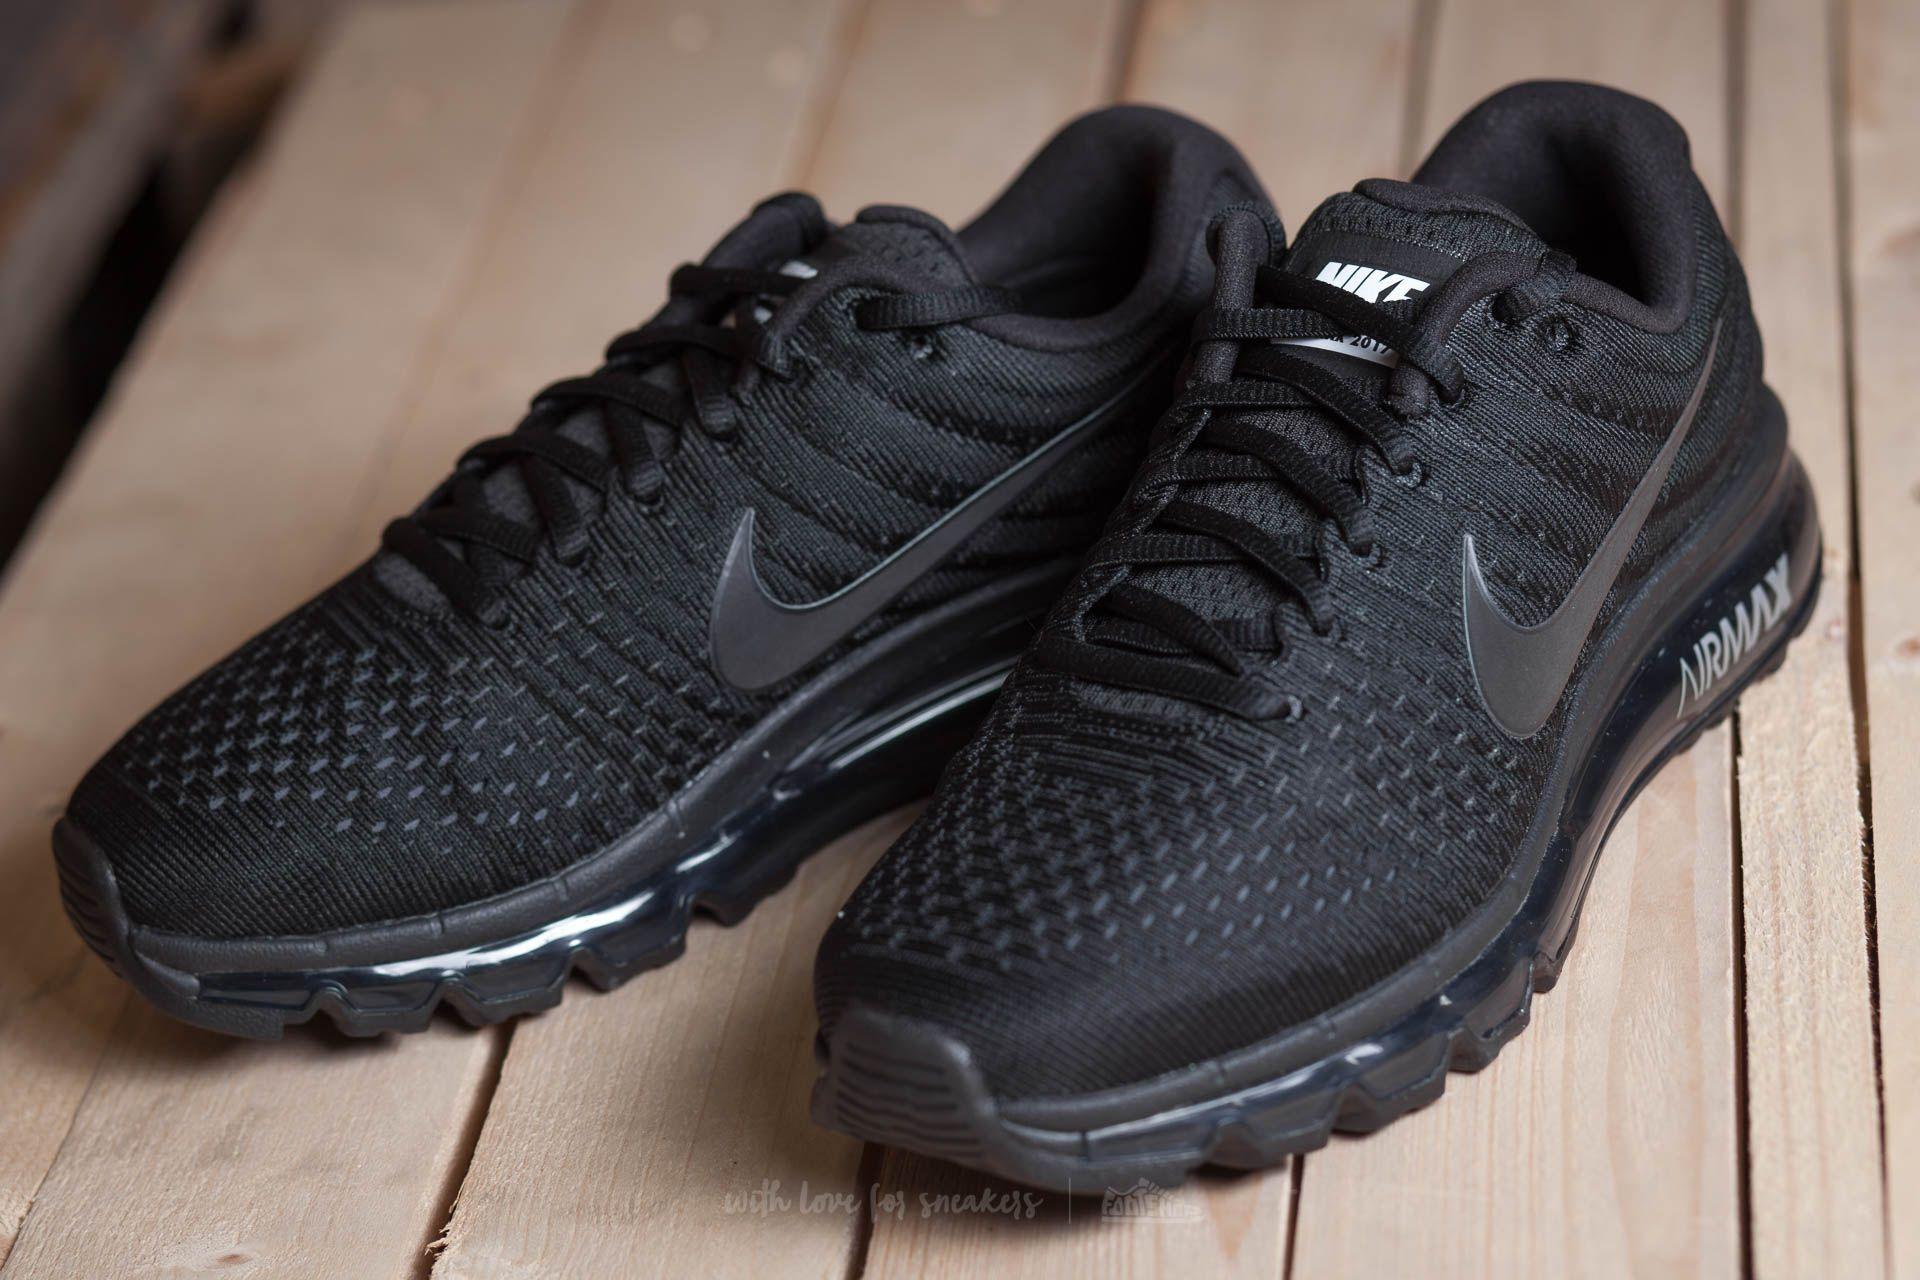 wholesale dealer b38c6 69ba7 Nike Air Max 2017 Black/ Black-Black | Footshop